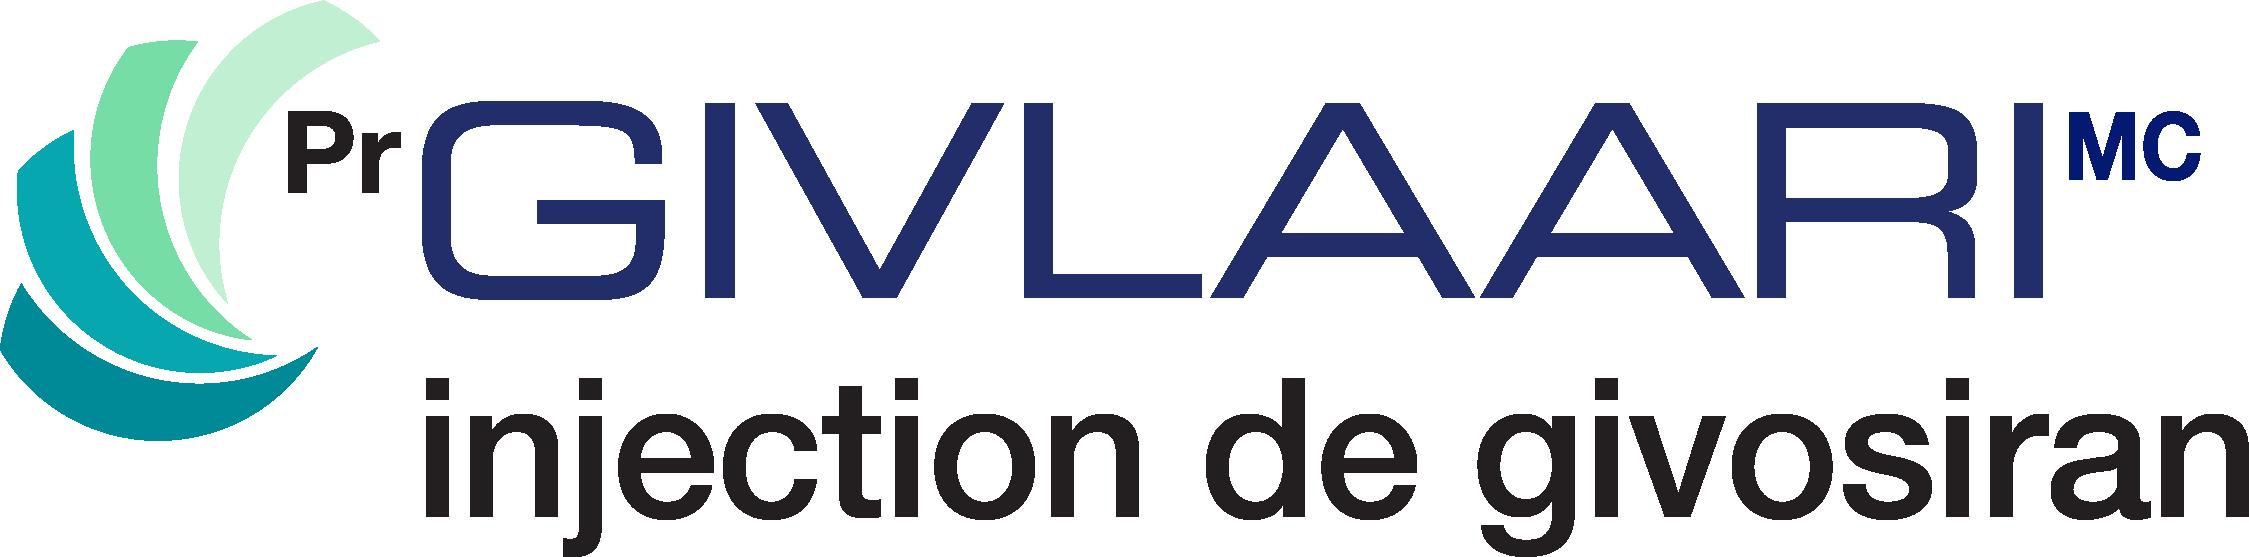 https://www.alnylam.ca/sites/default/files/revslider/image/givlaari-slider-french.png